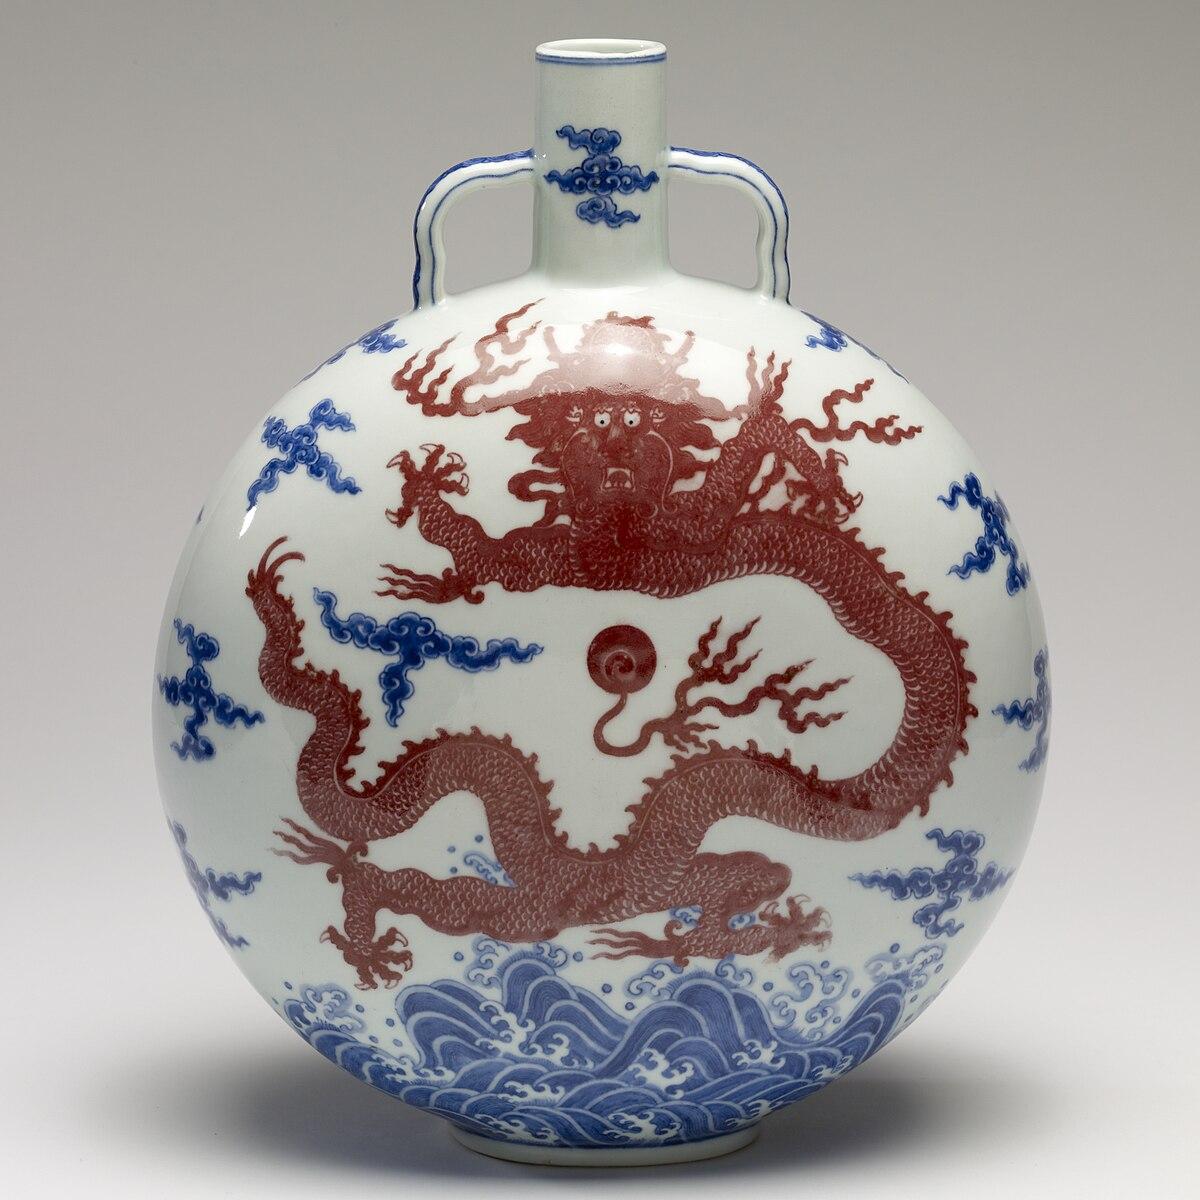 Porcelain - Wikipedia